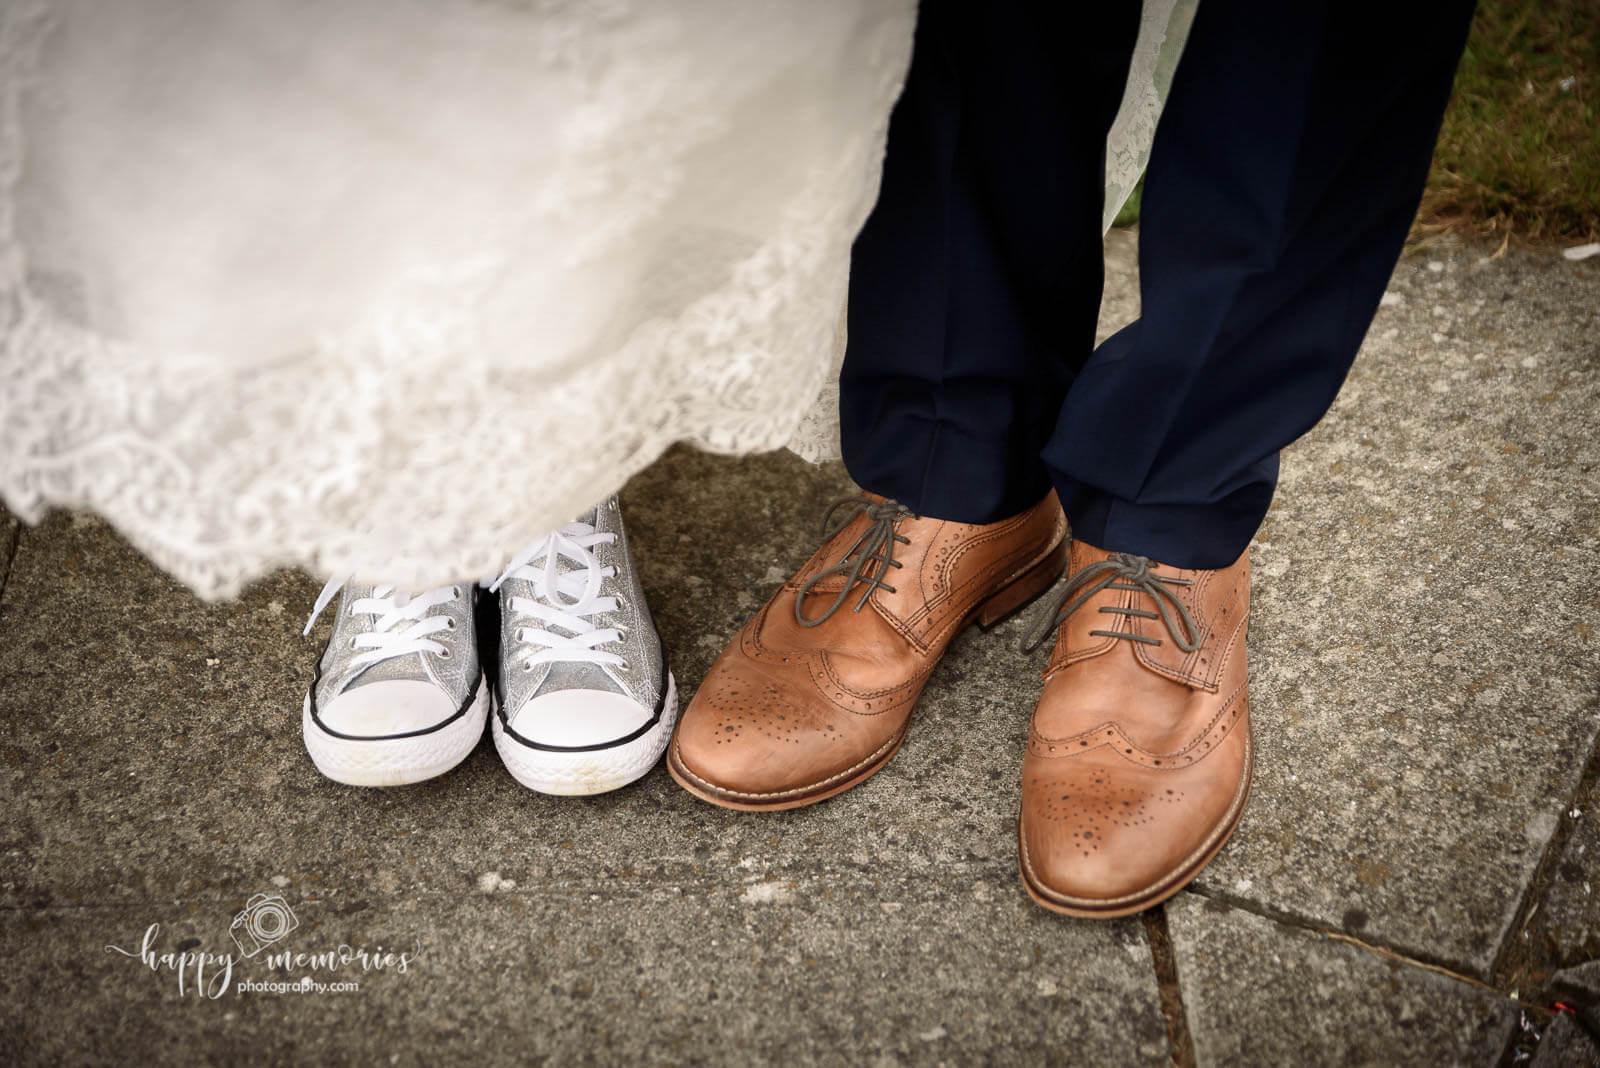 Wedding photographer East Grinstead-31